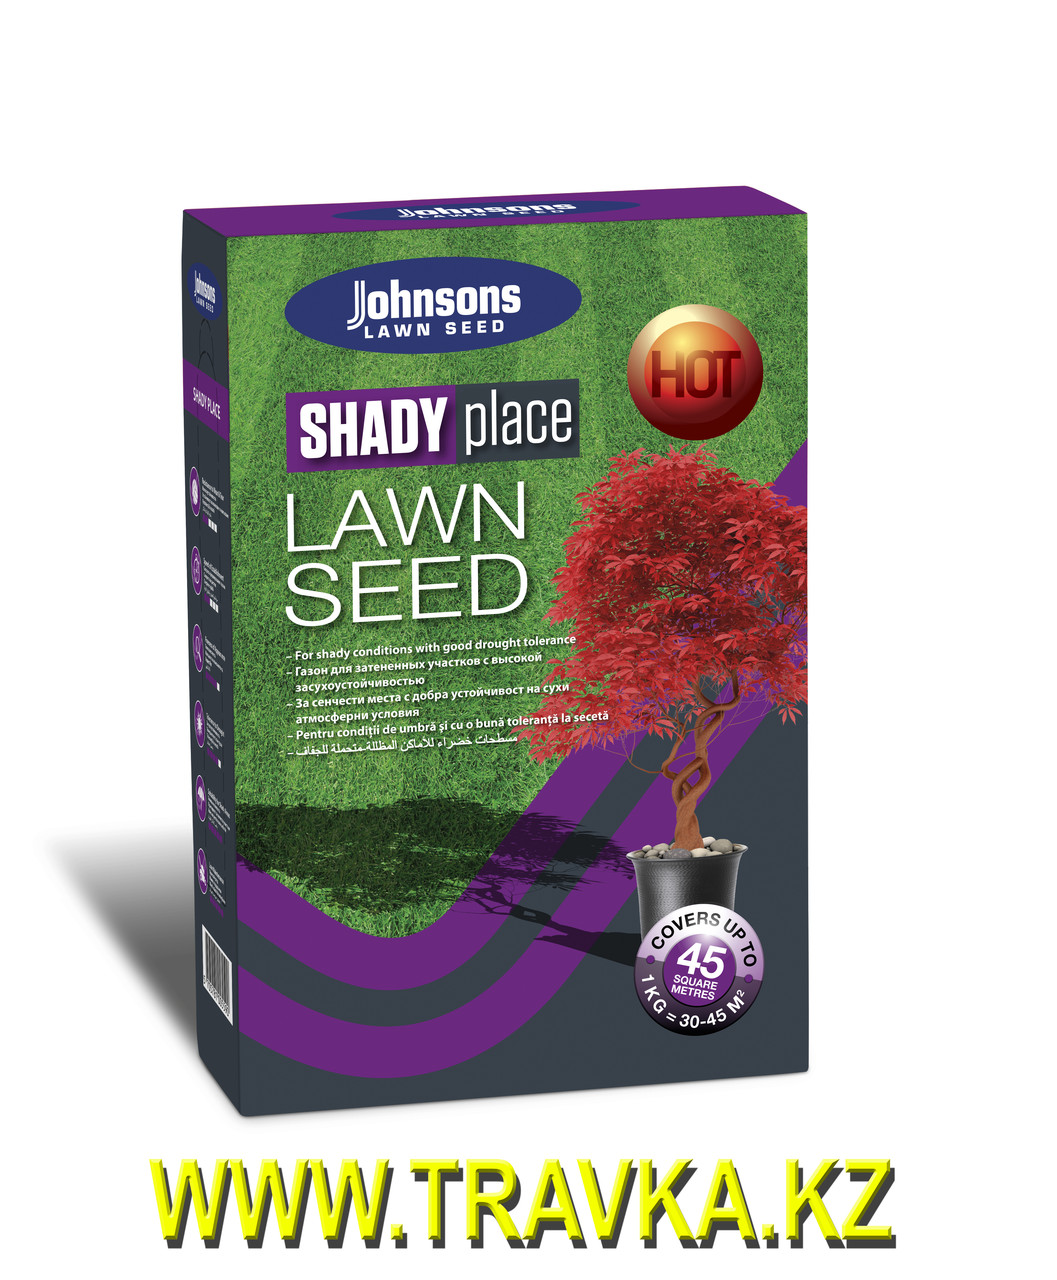 Газонная трава «SHADY PLACE» JOHNSONS в коробках 1 кг